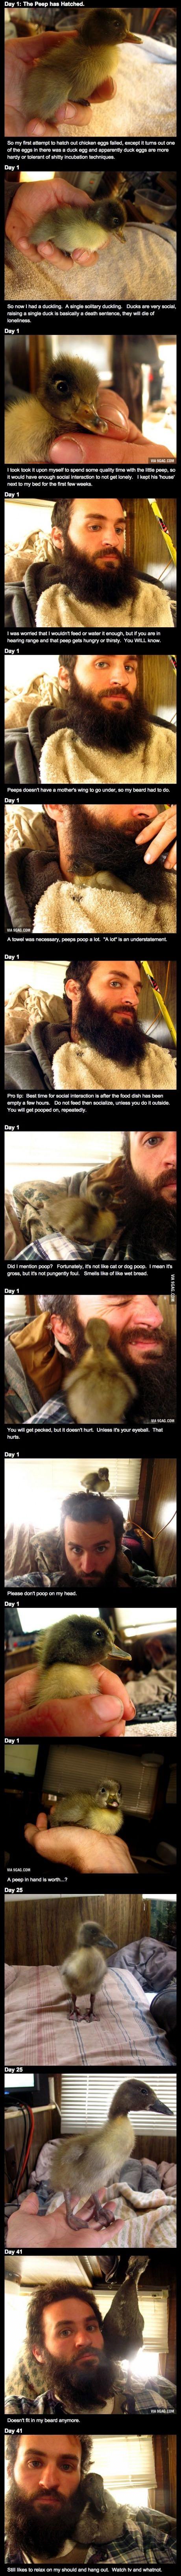 A man, His beard, And a ducky